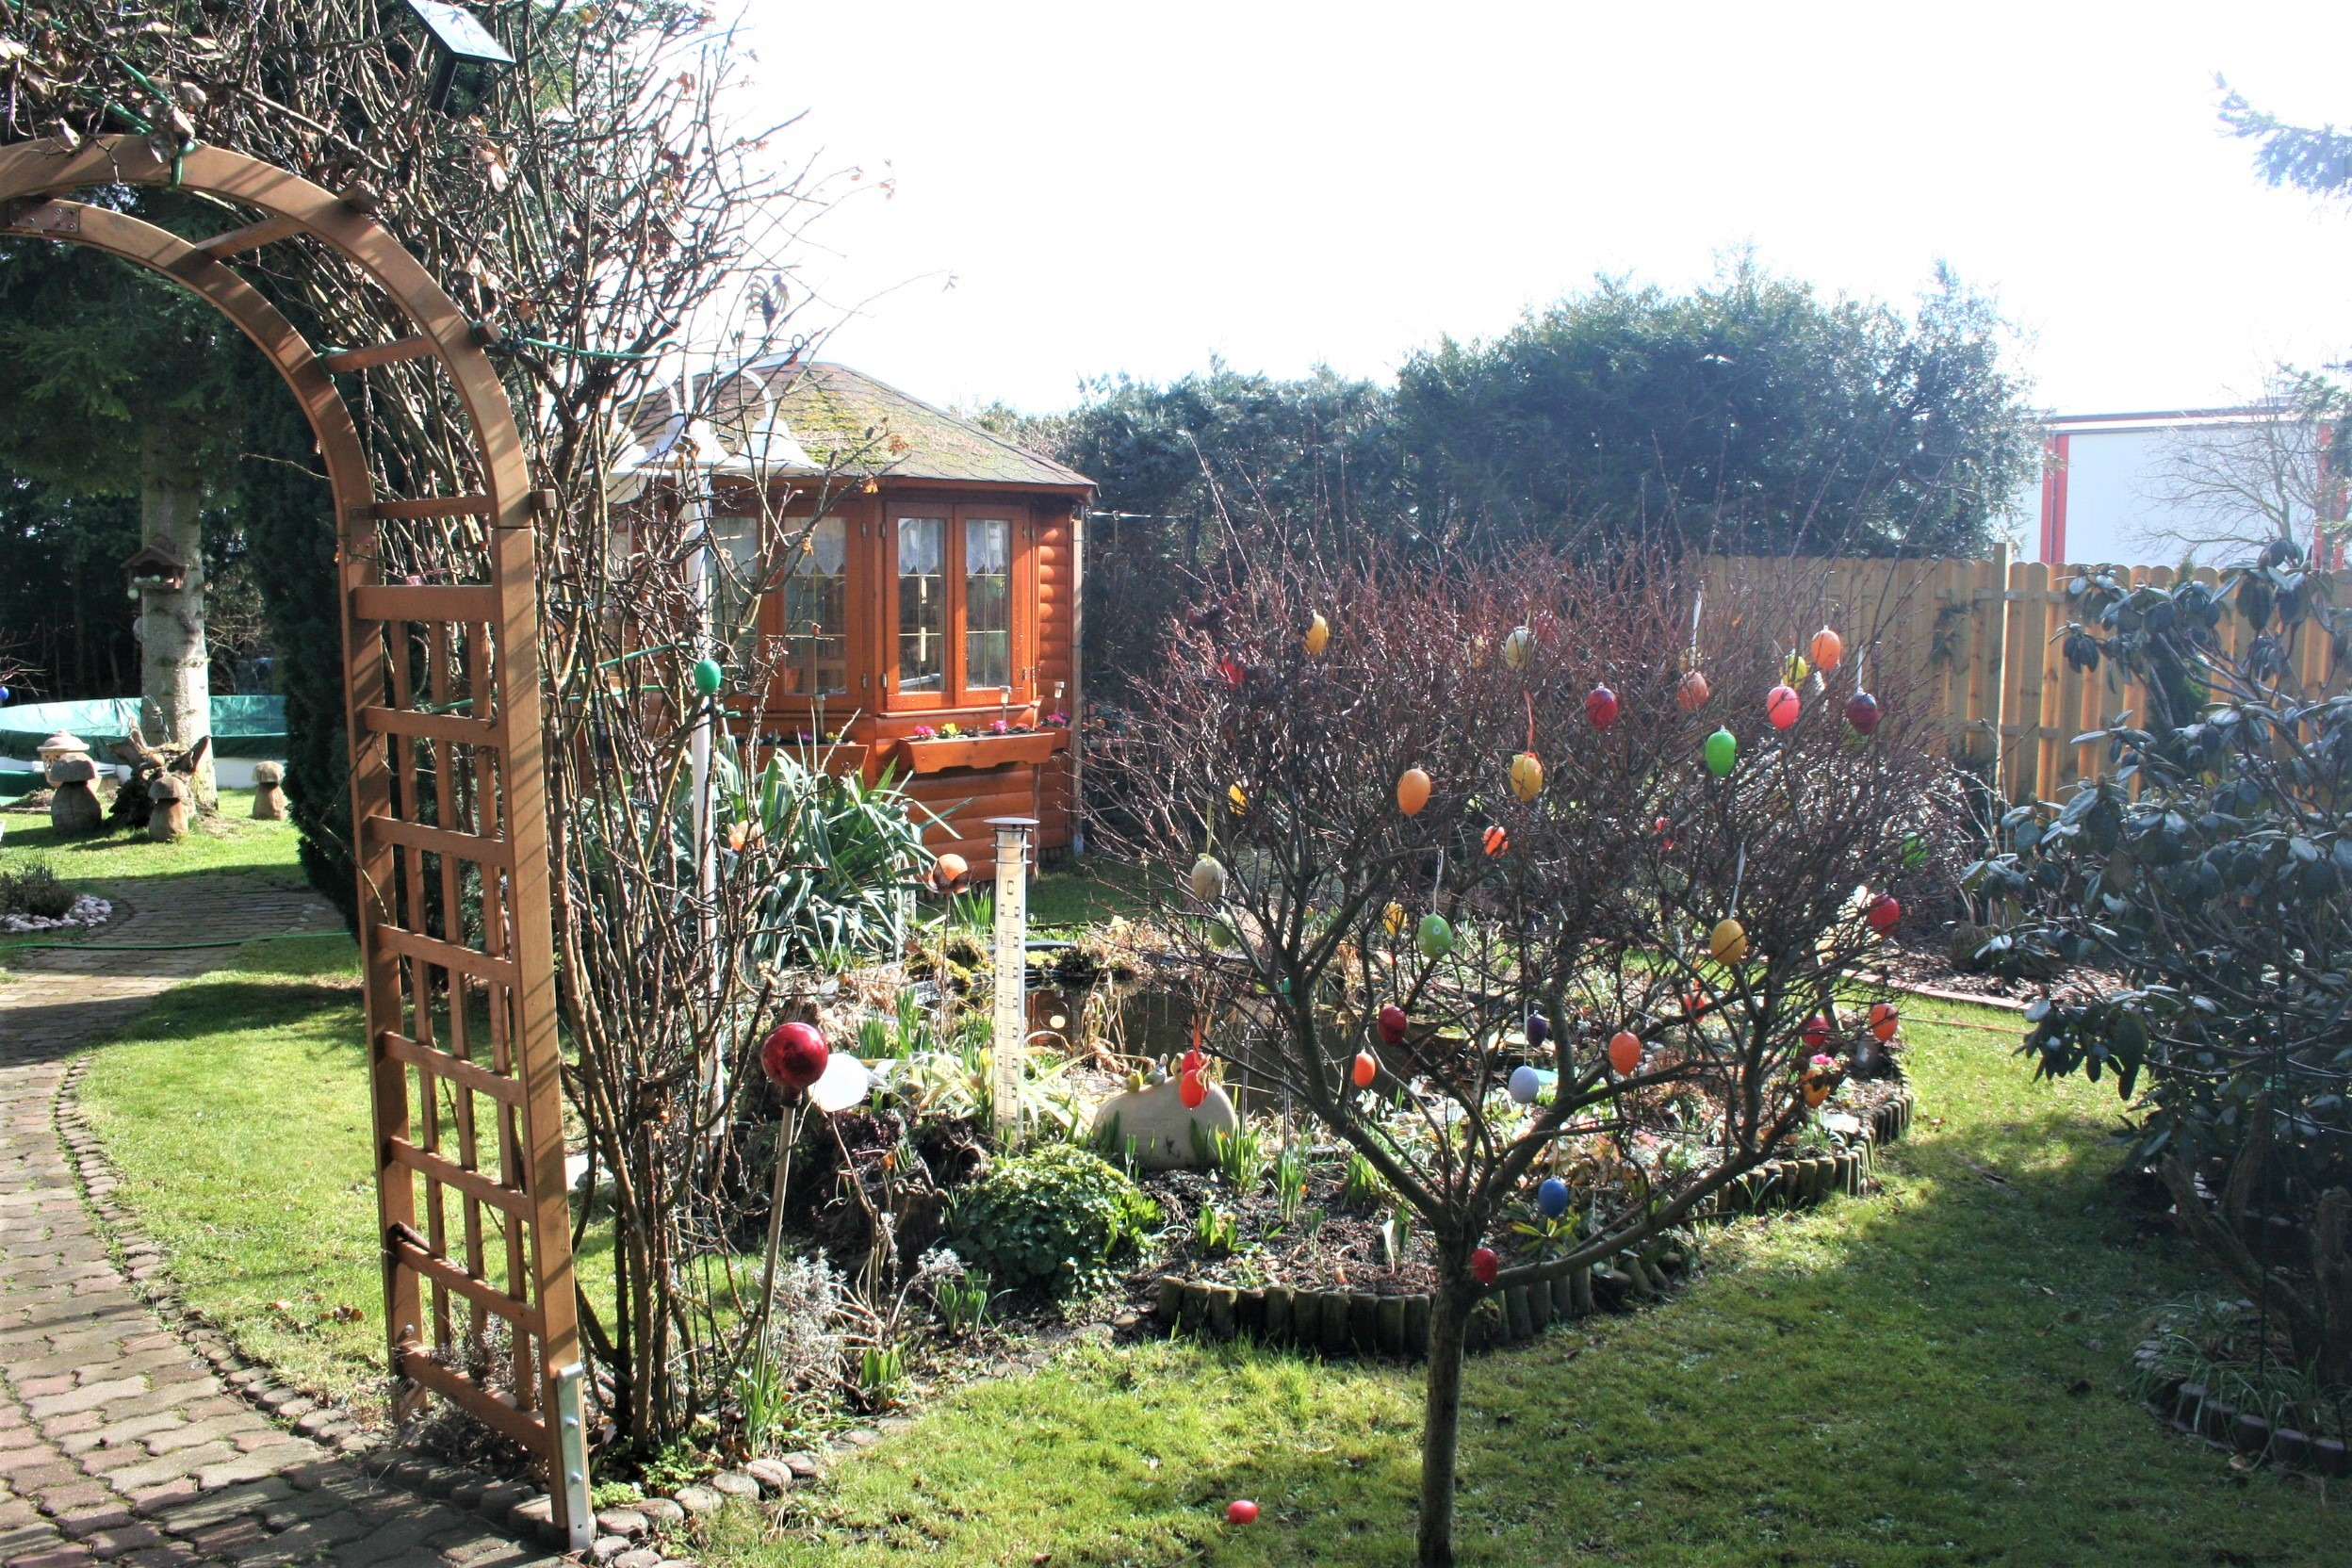 Mehrfamilienhaus/Pension in Peißen - Gartendetail